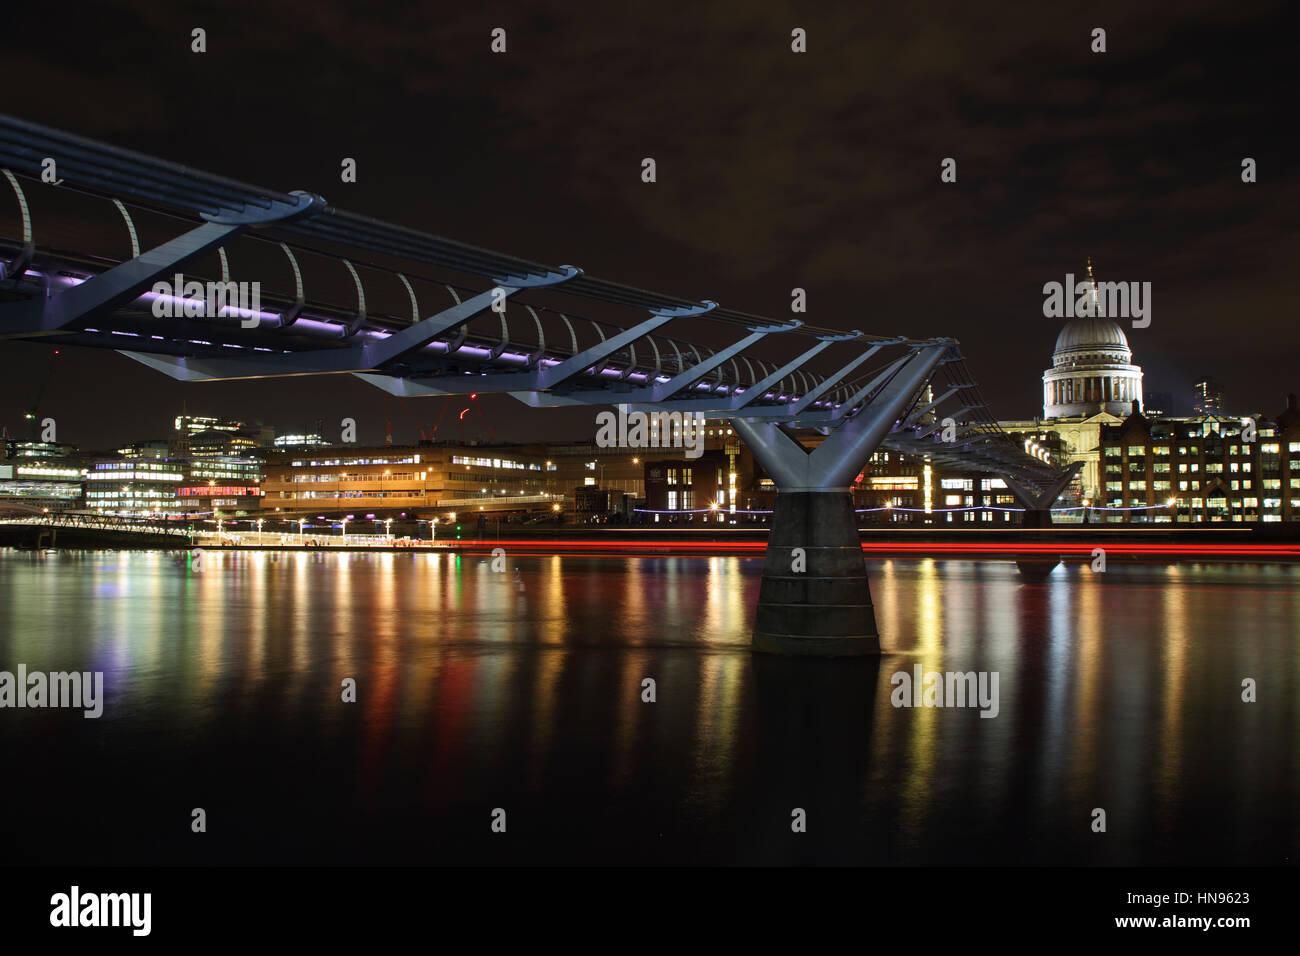 The Millennium Bridge across the Thames, London, United Kingdom - Stock Image